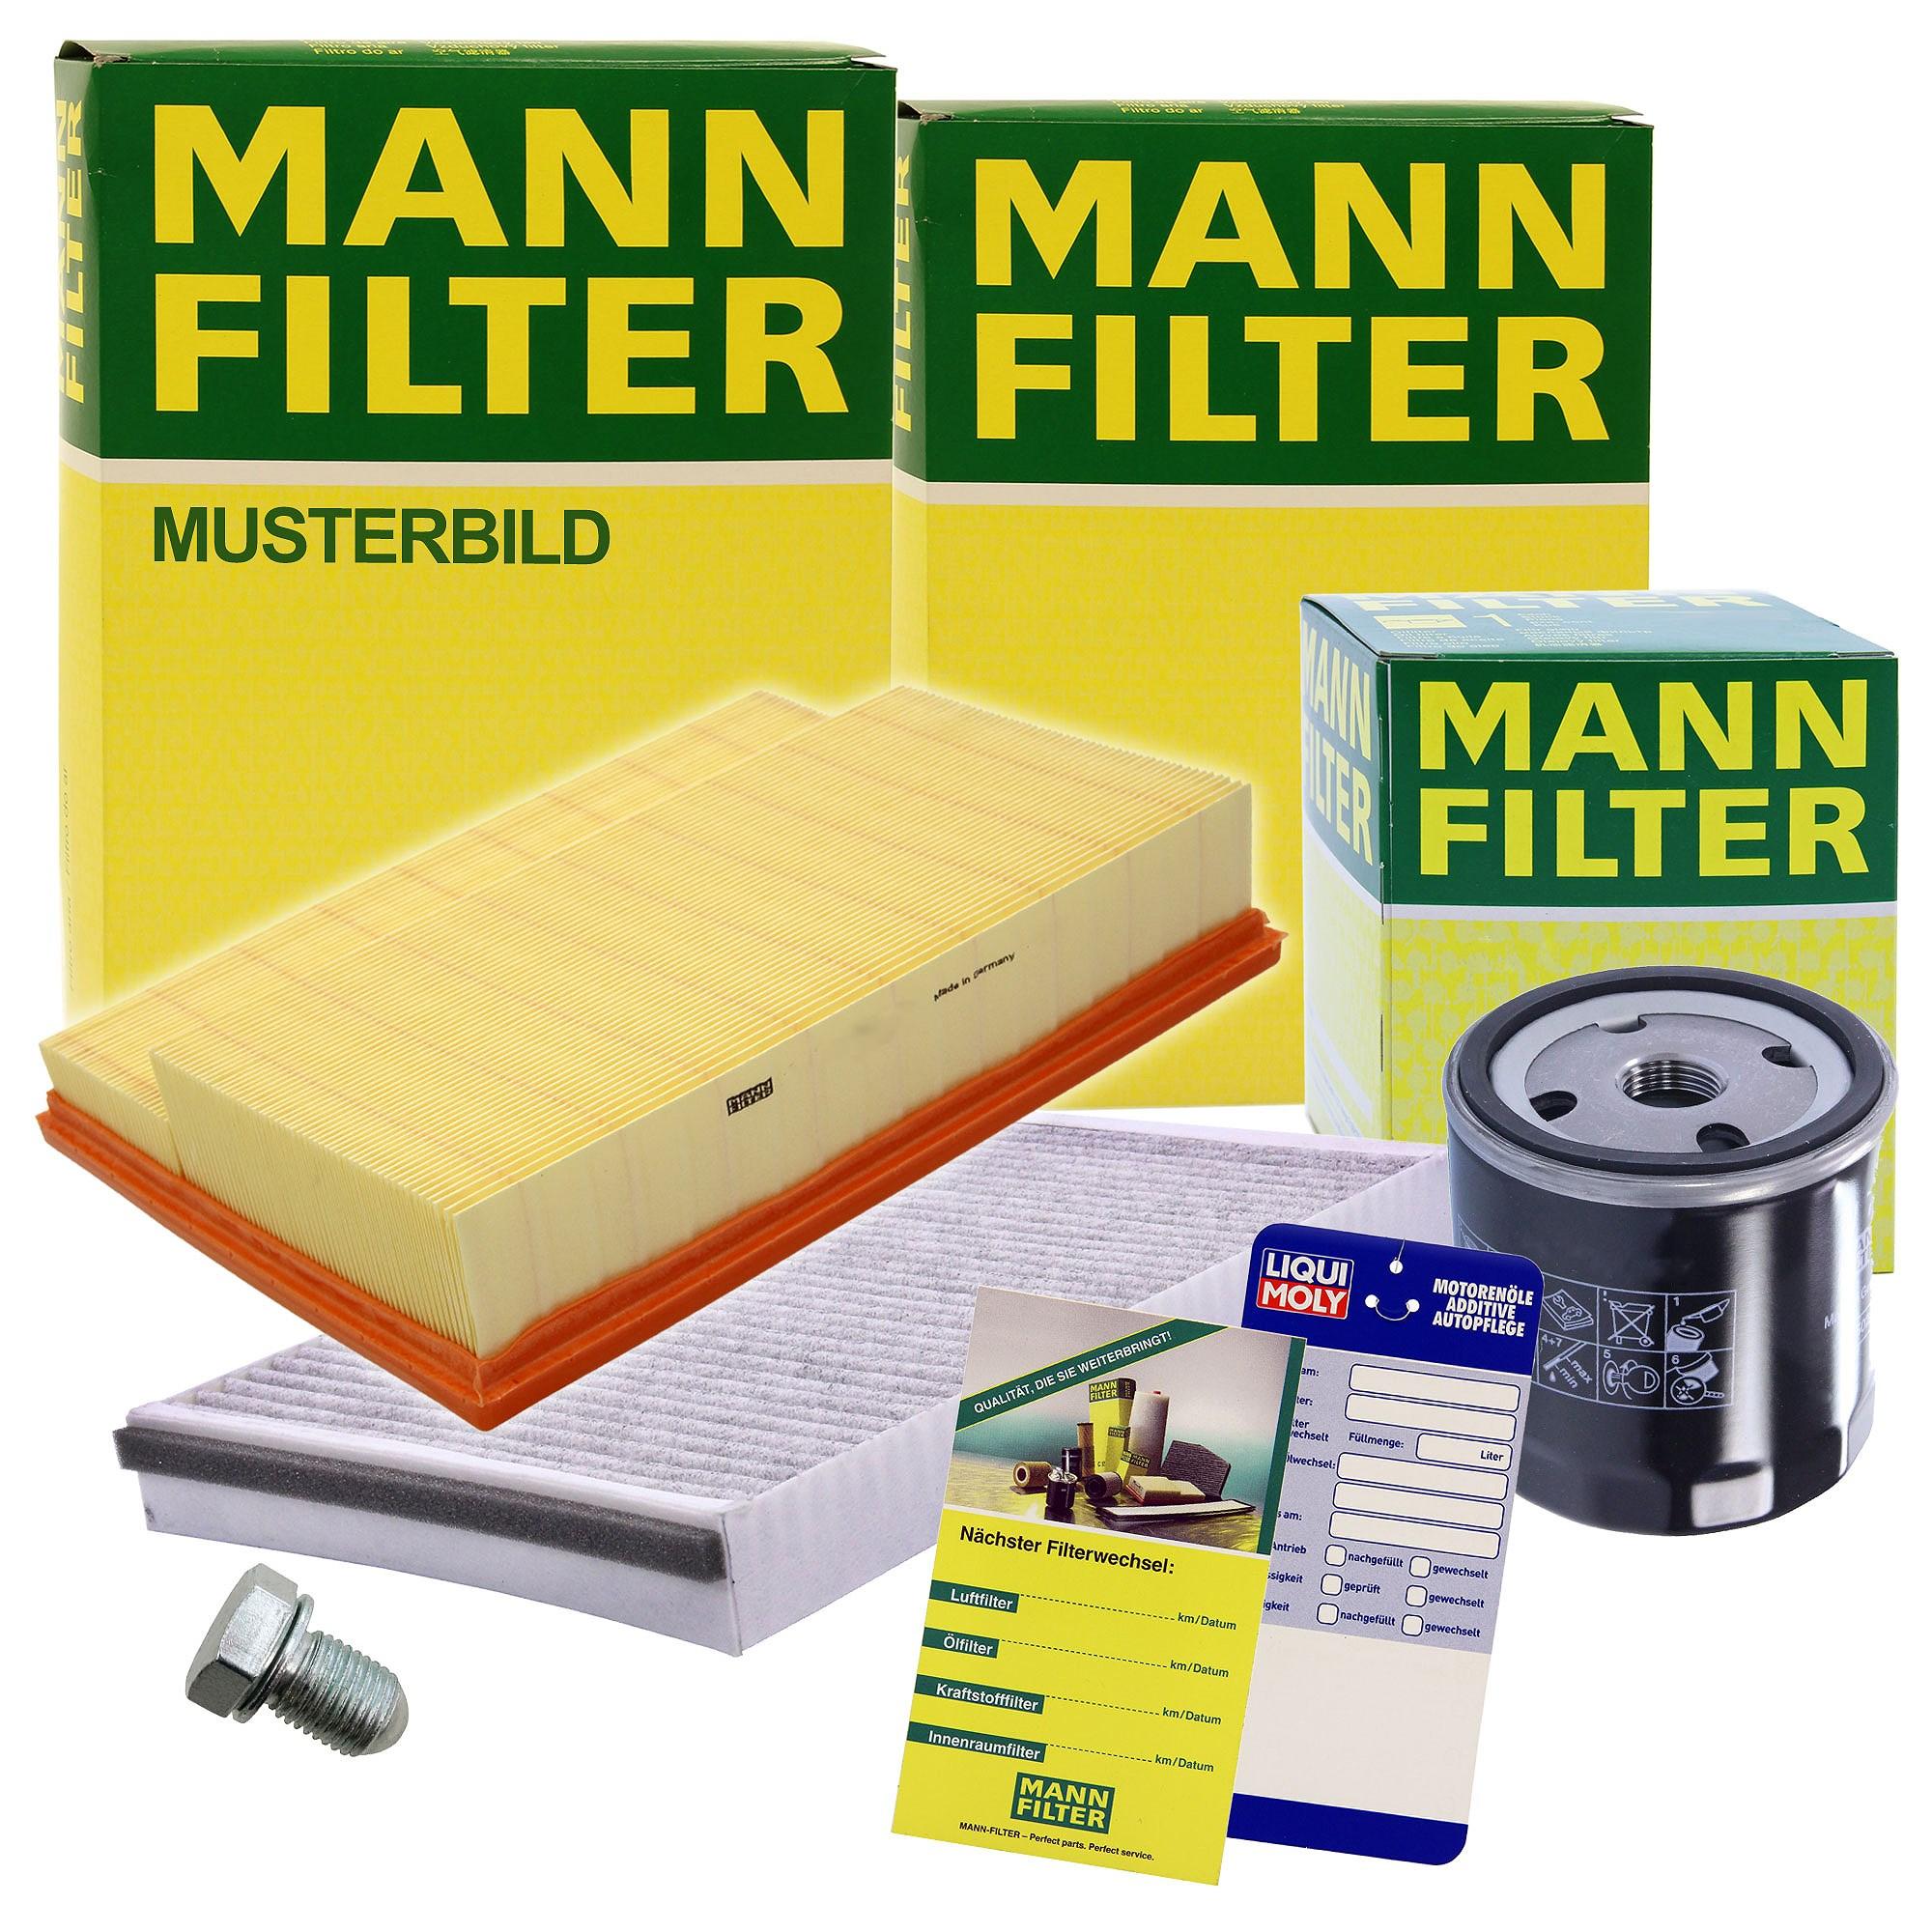 Inspektionspaket SET A 1x /Ölfilter 1x Luftfilter 1x Innenraumfilter 1x /Ölablass-Schraube 1x Dichtring f/ür /Ölablass-Schraube